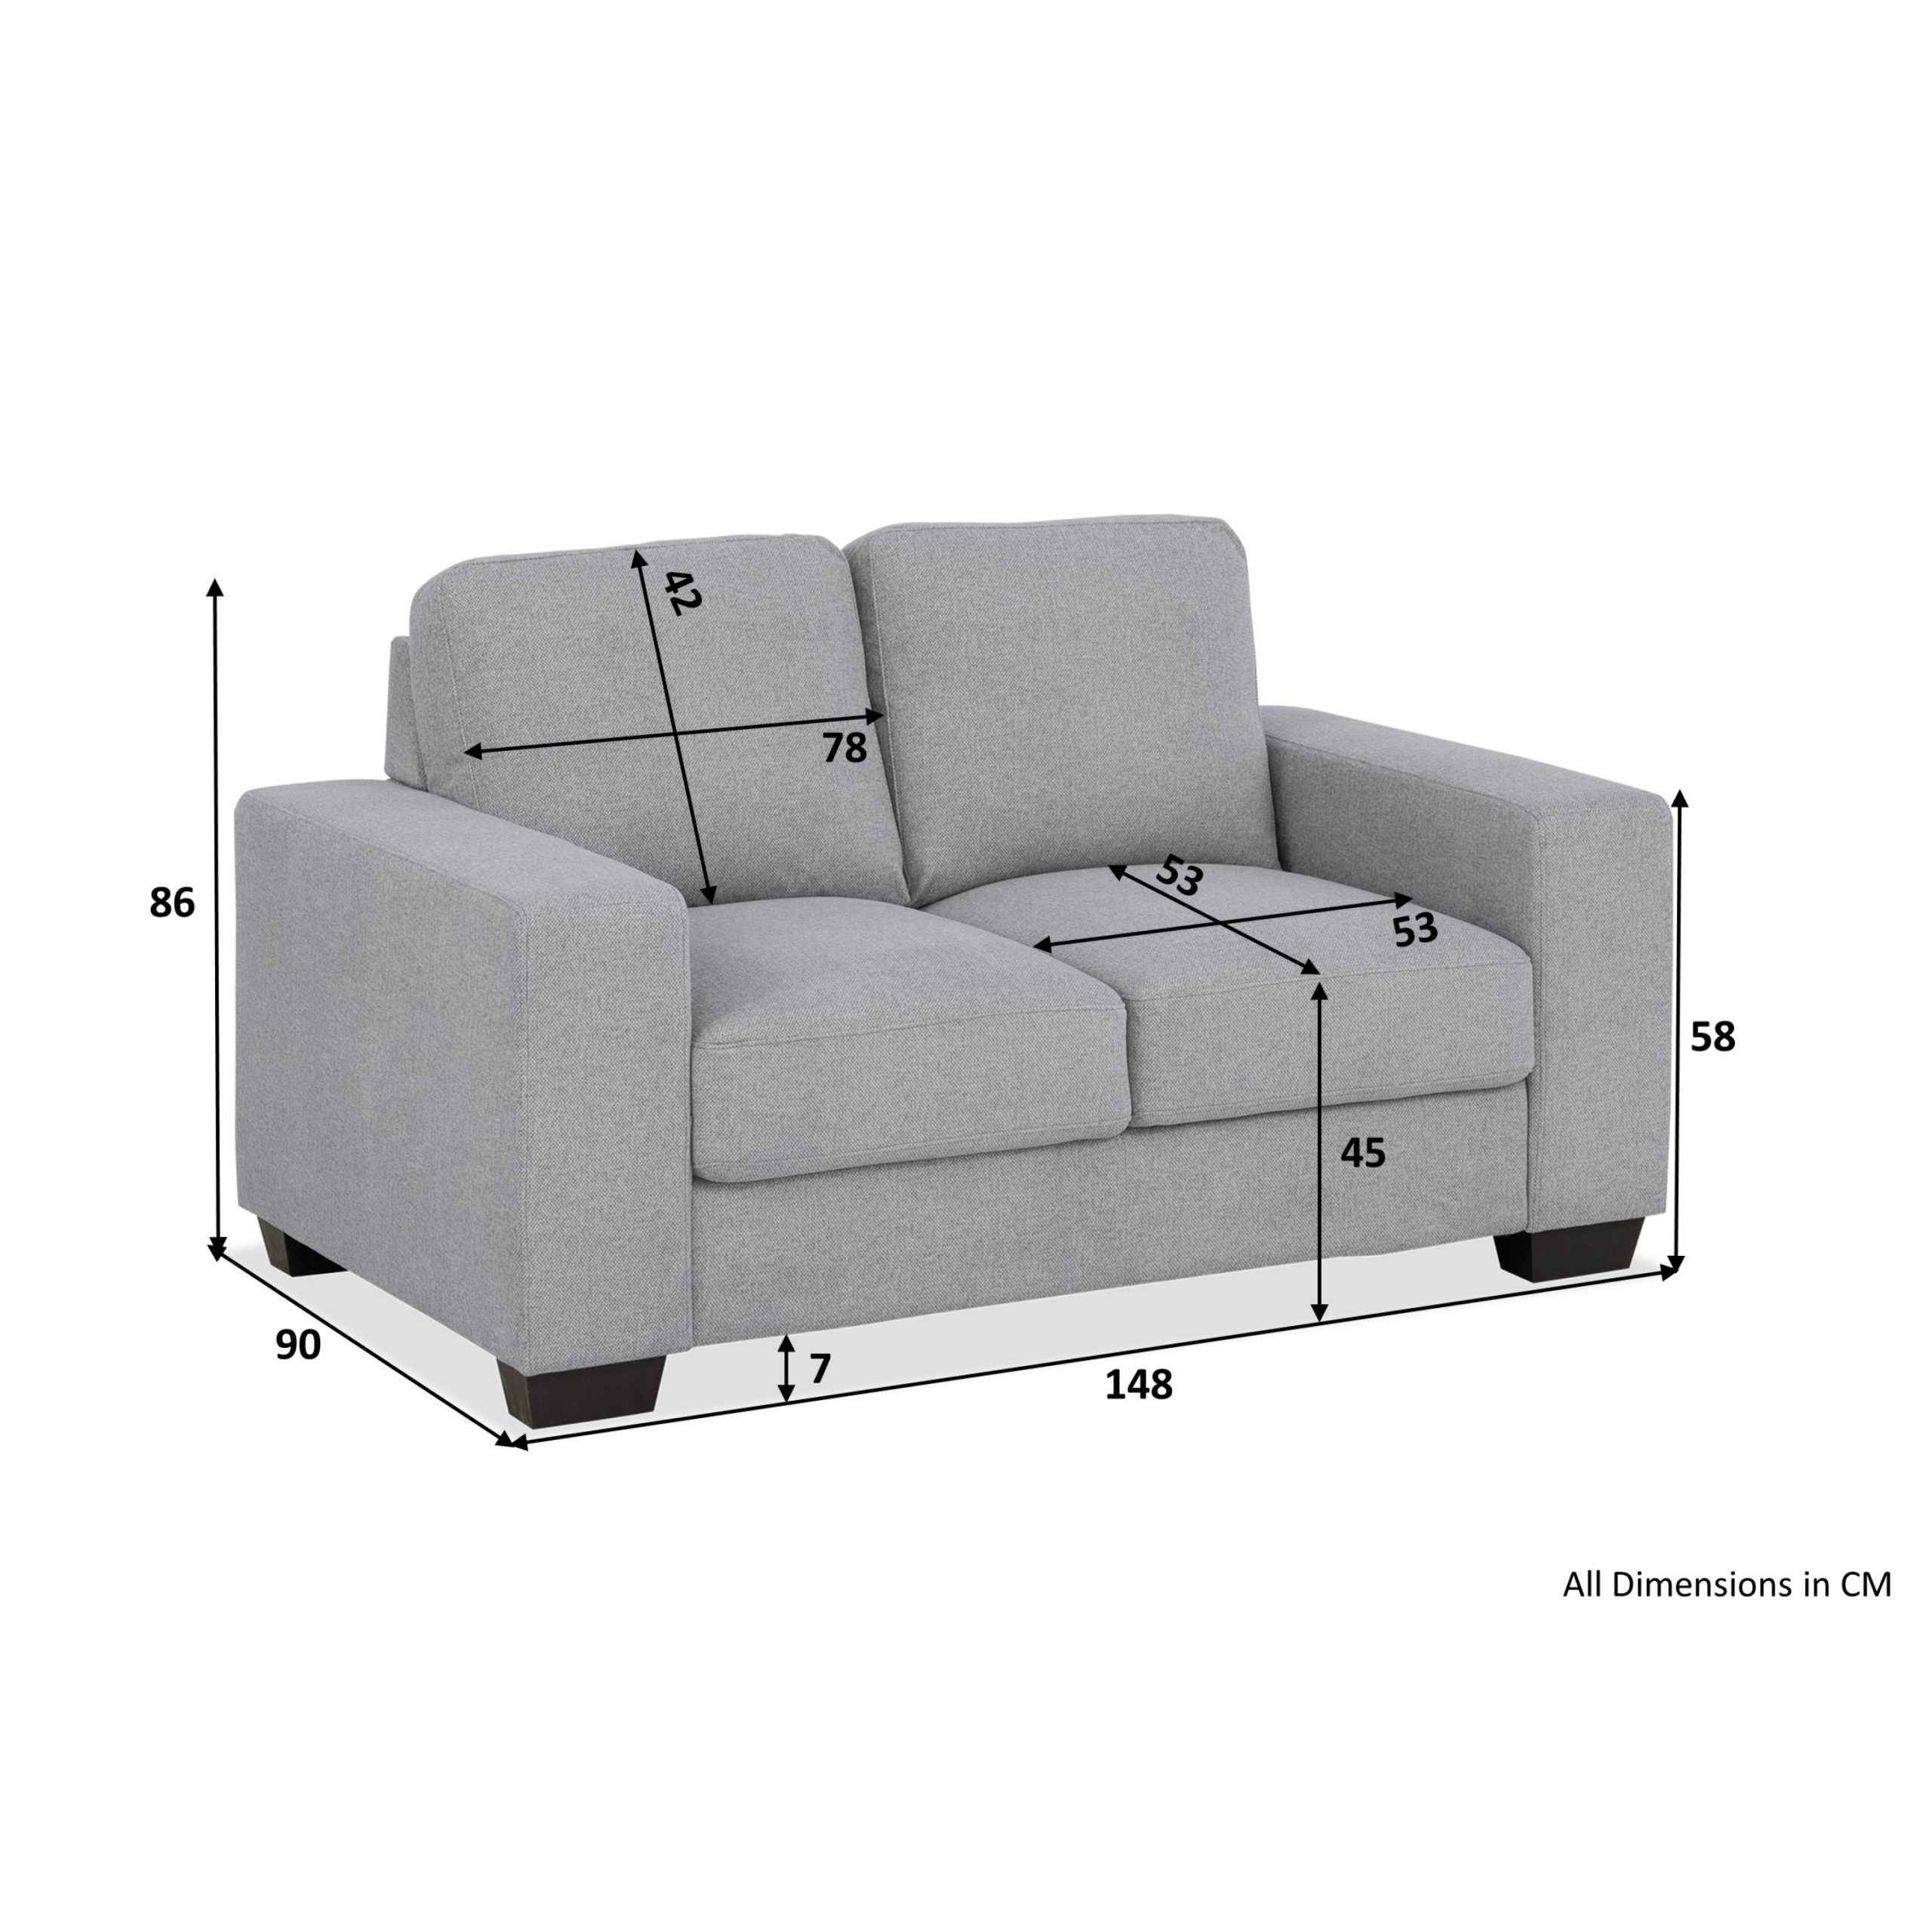 Alexis 2 Seater Sofa (Flat Dark Grey) – 2 Seaters – Sofas With Regard To Two Seater Sofas (View 5 of 15)